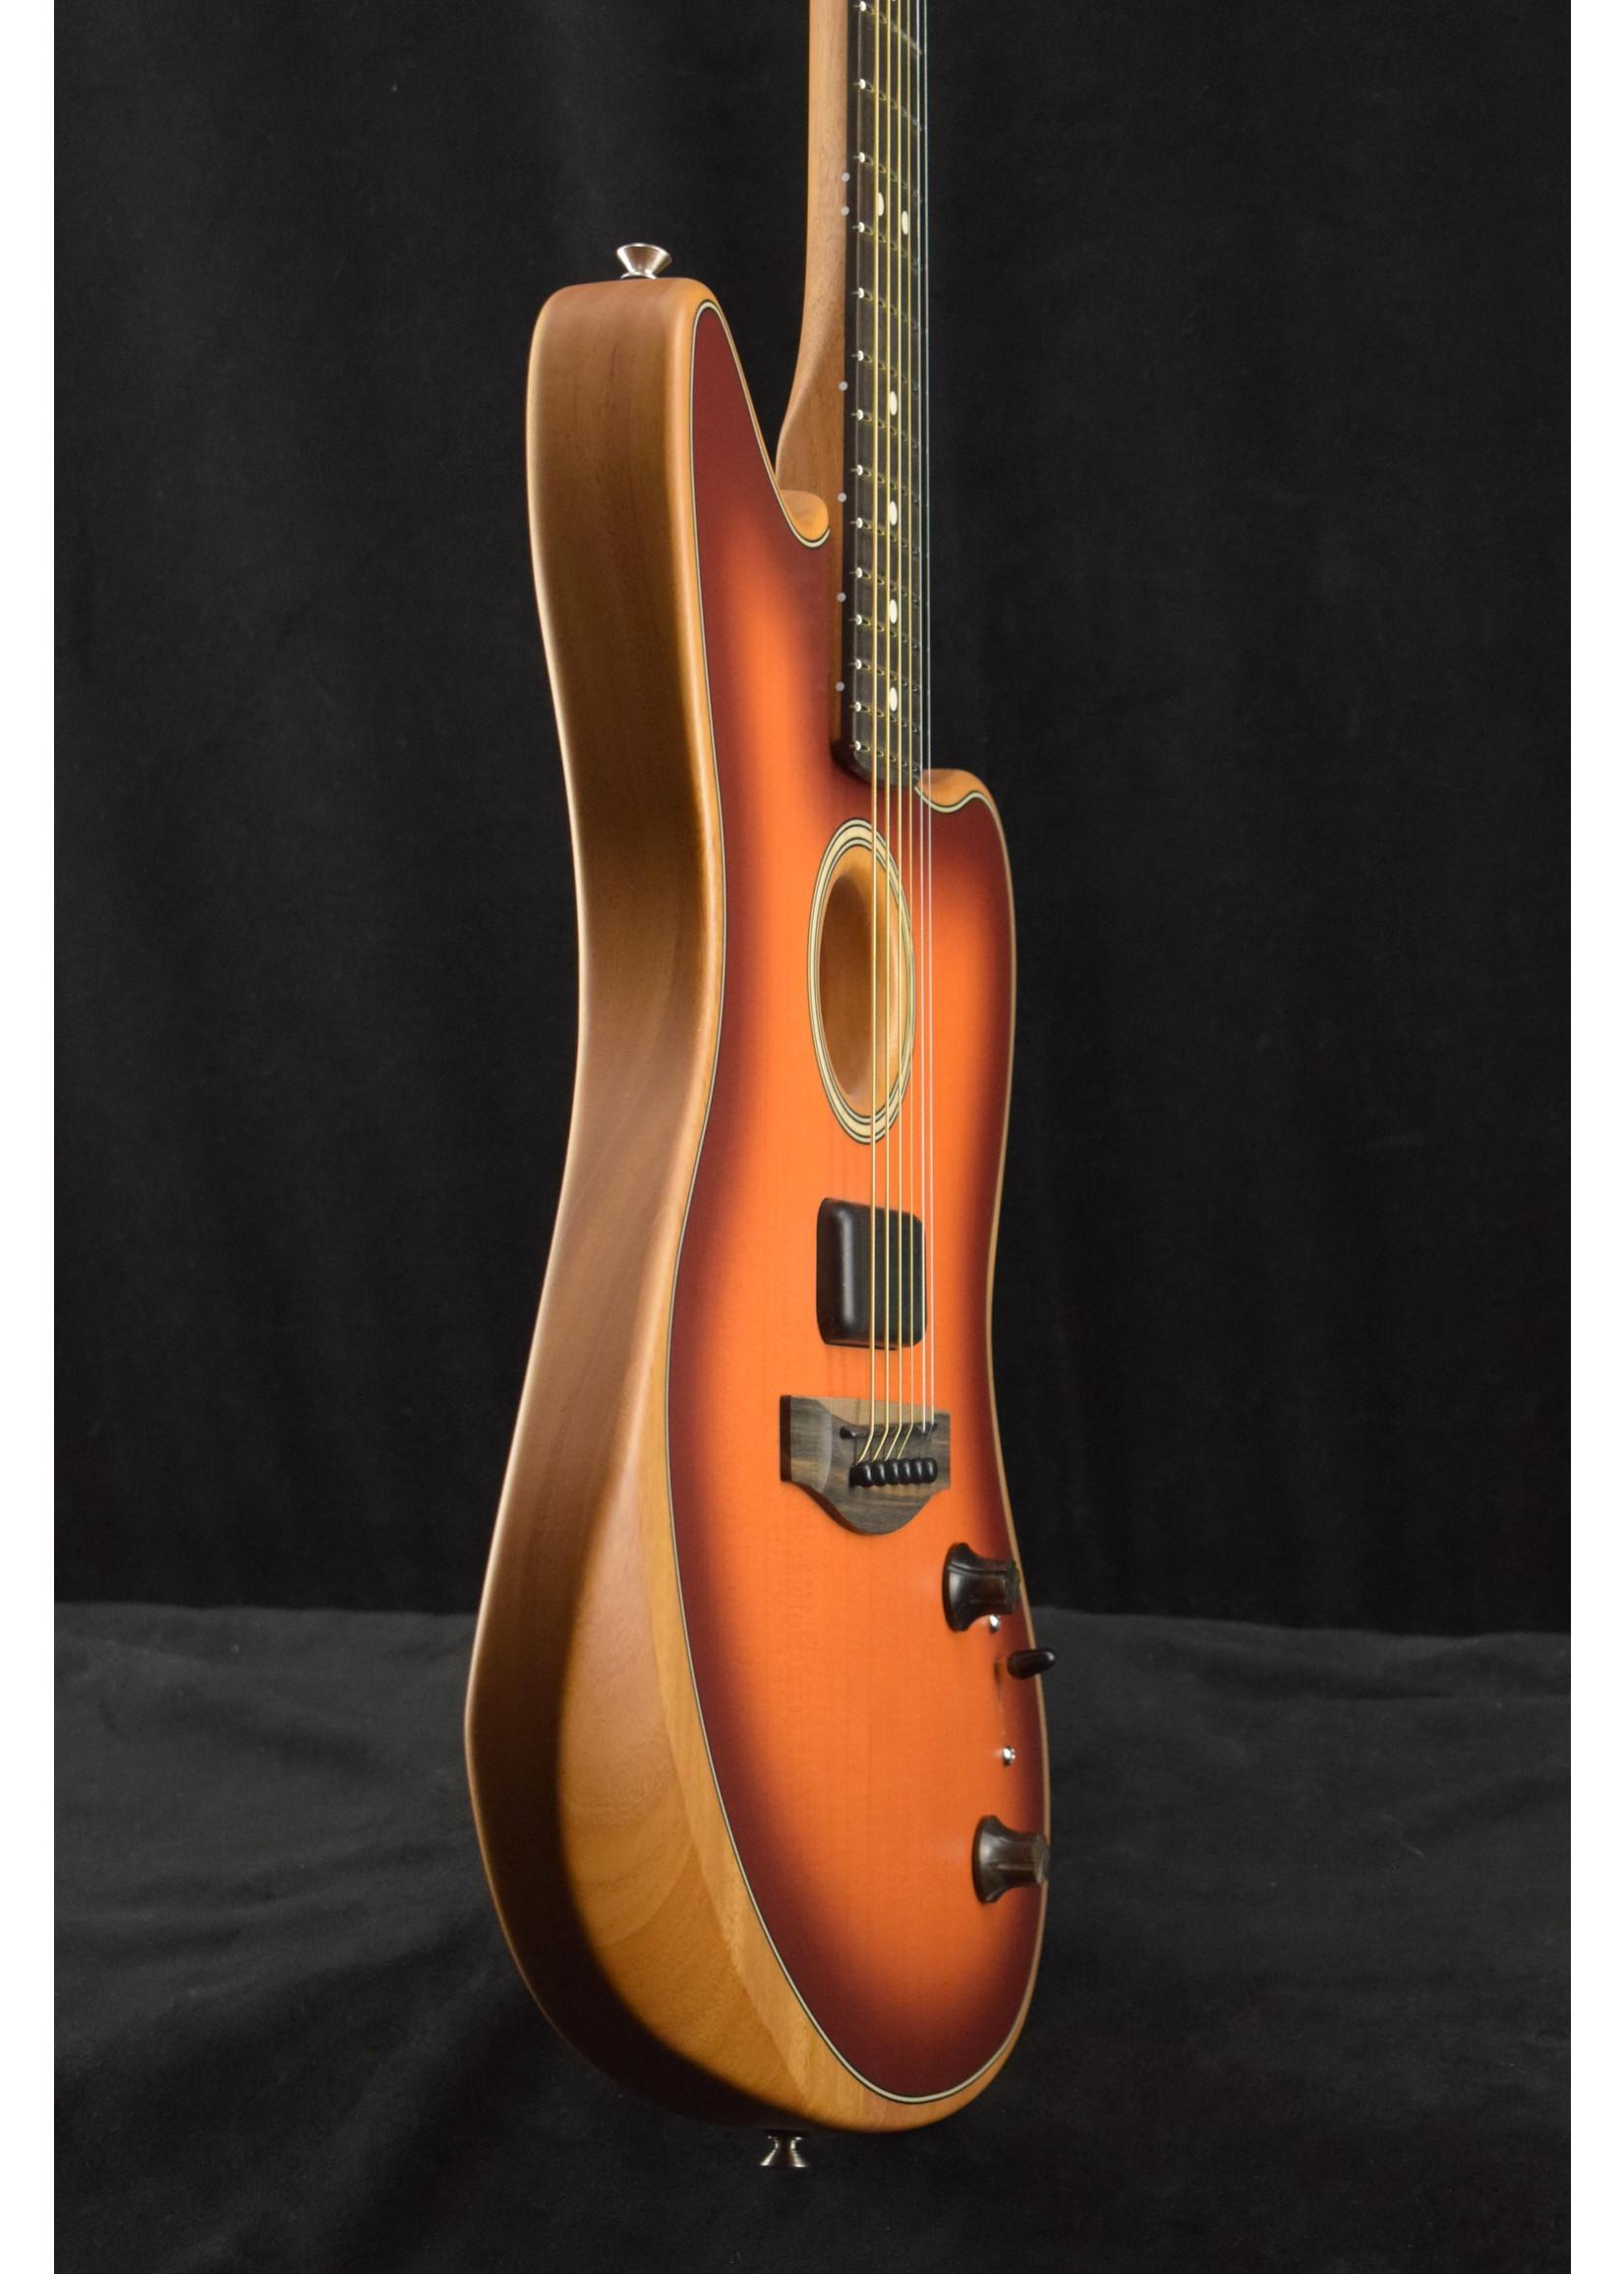 Fender Fender American Acoustasonic Jazzmaster Ebony Fingerboard Tobacco Sunburst